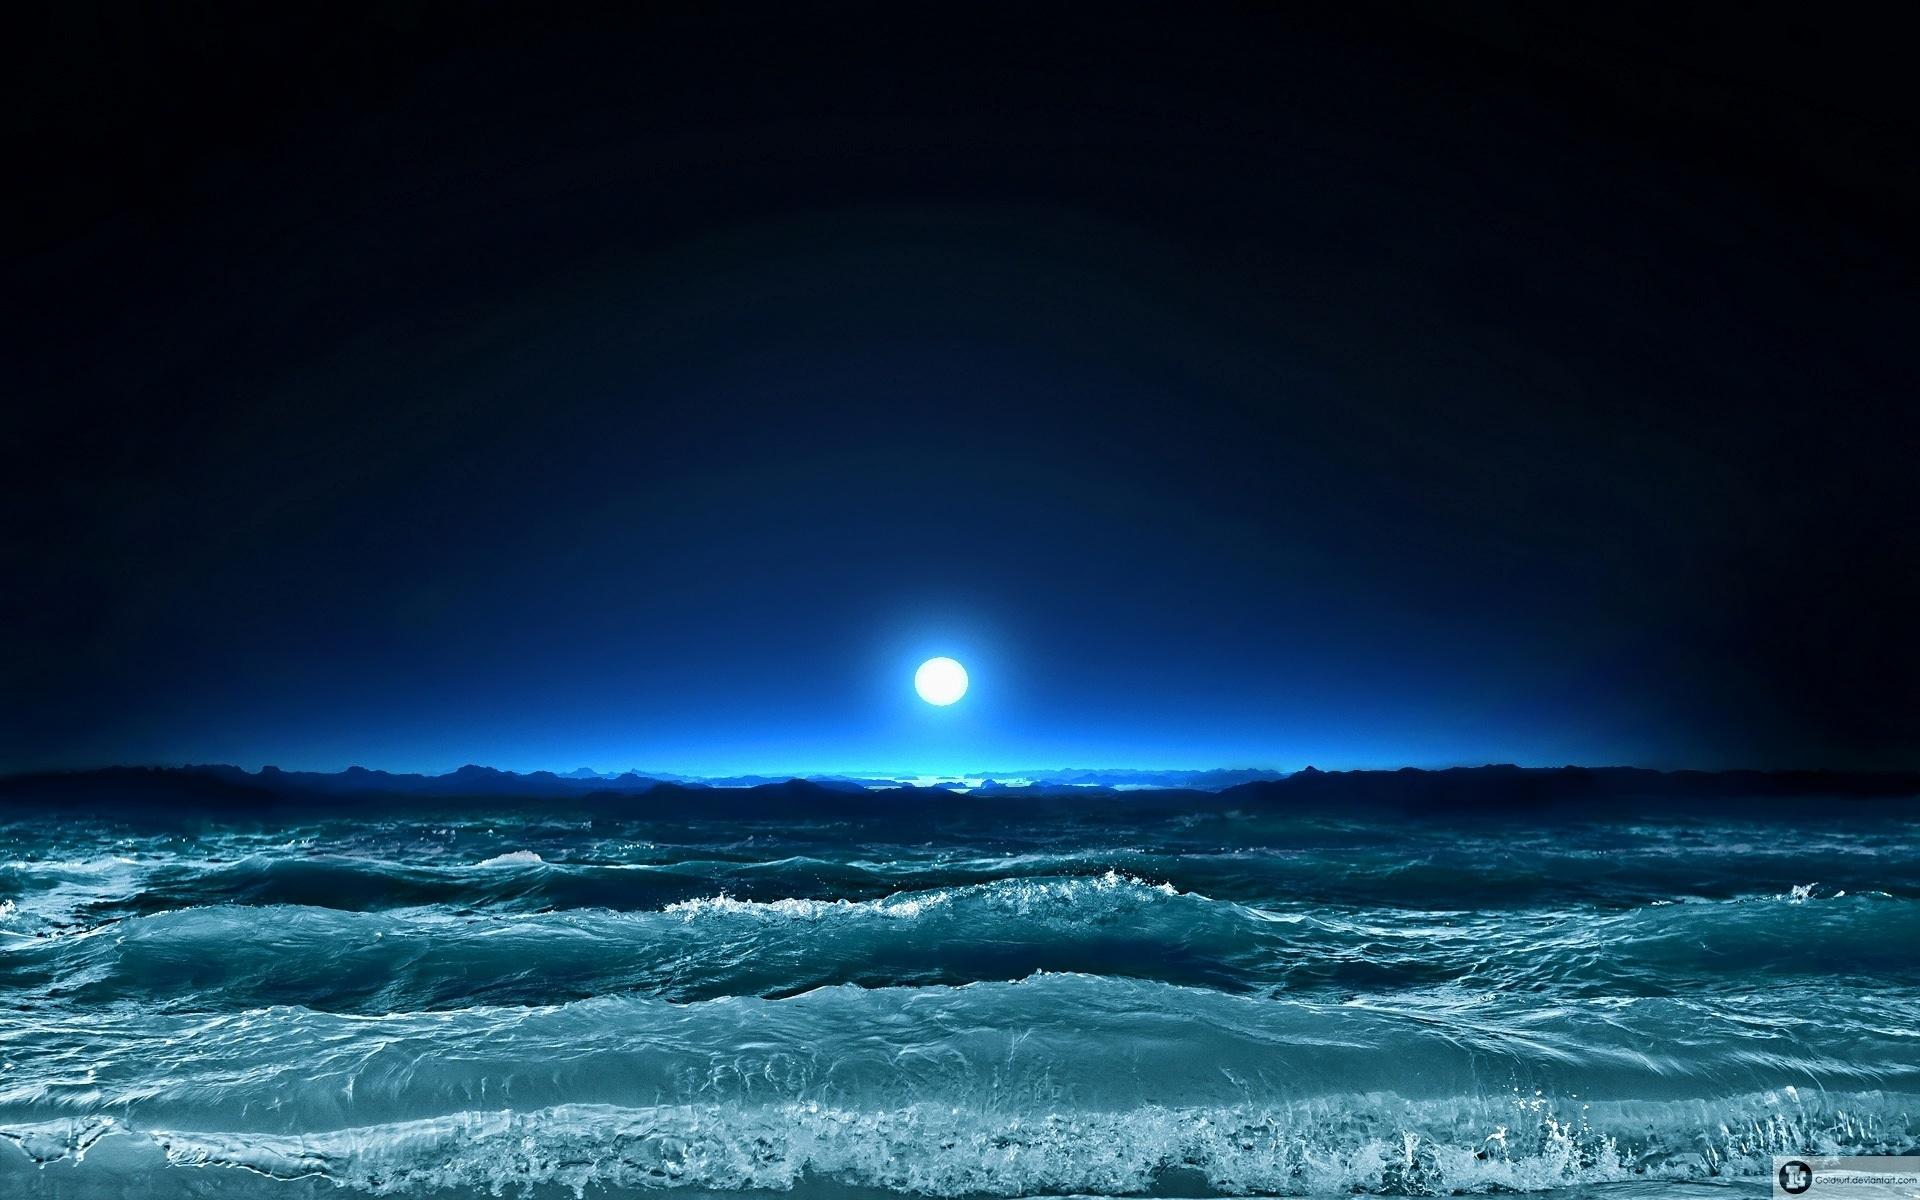 fondos de pantalla luna ligero mar noche olas art